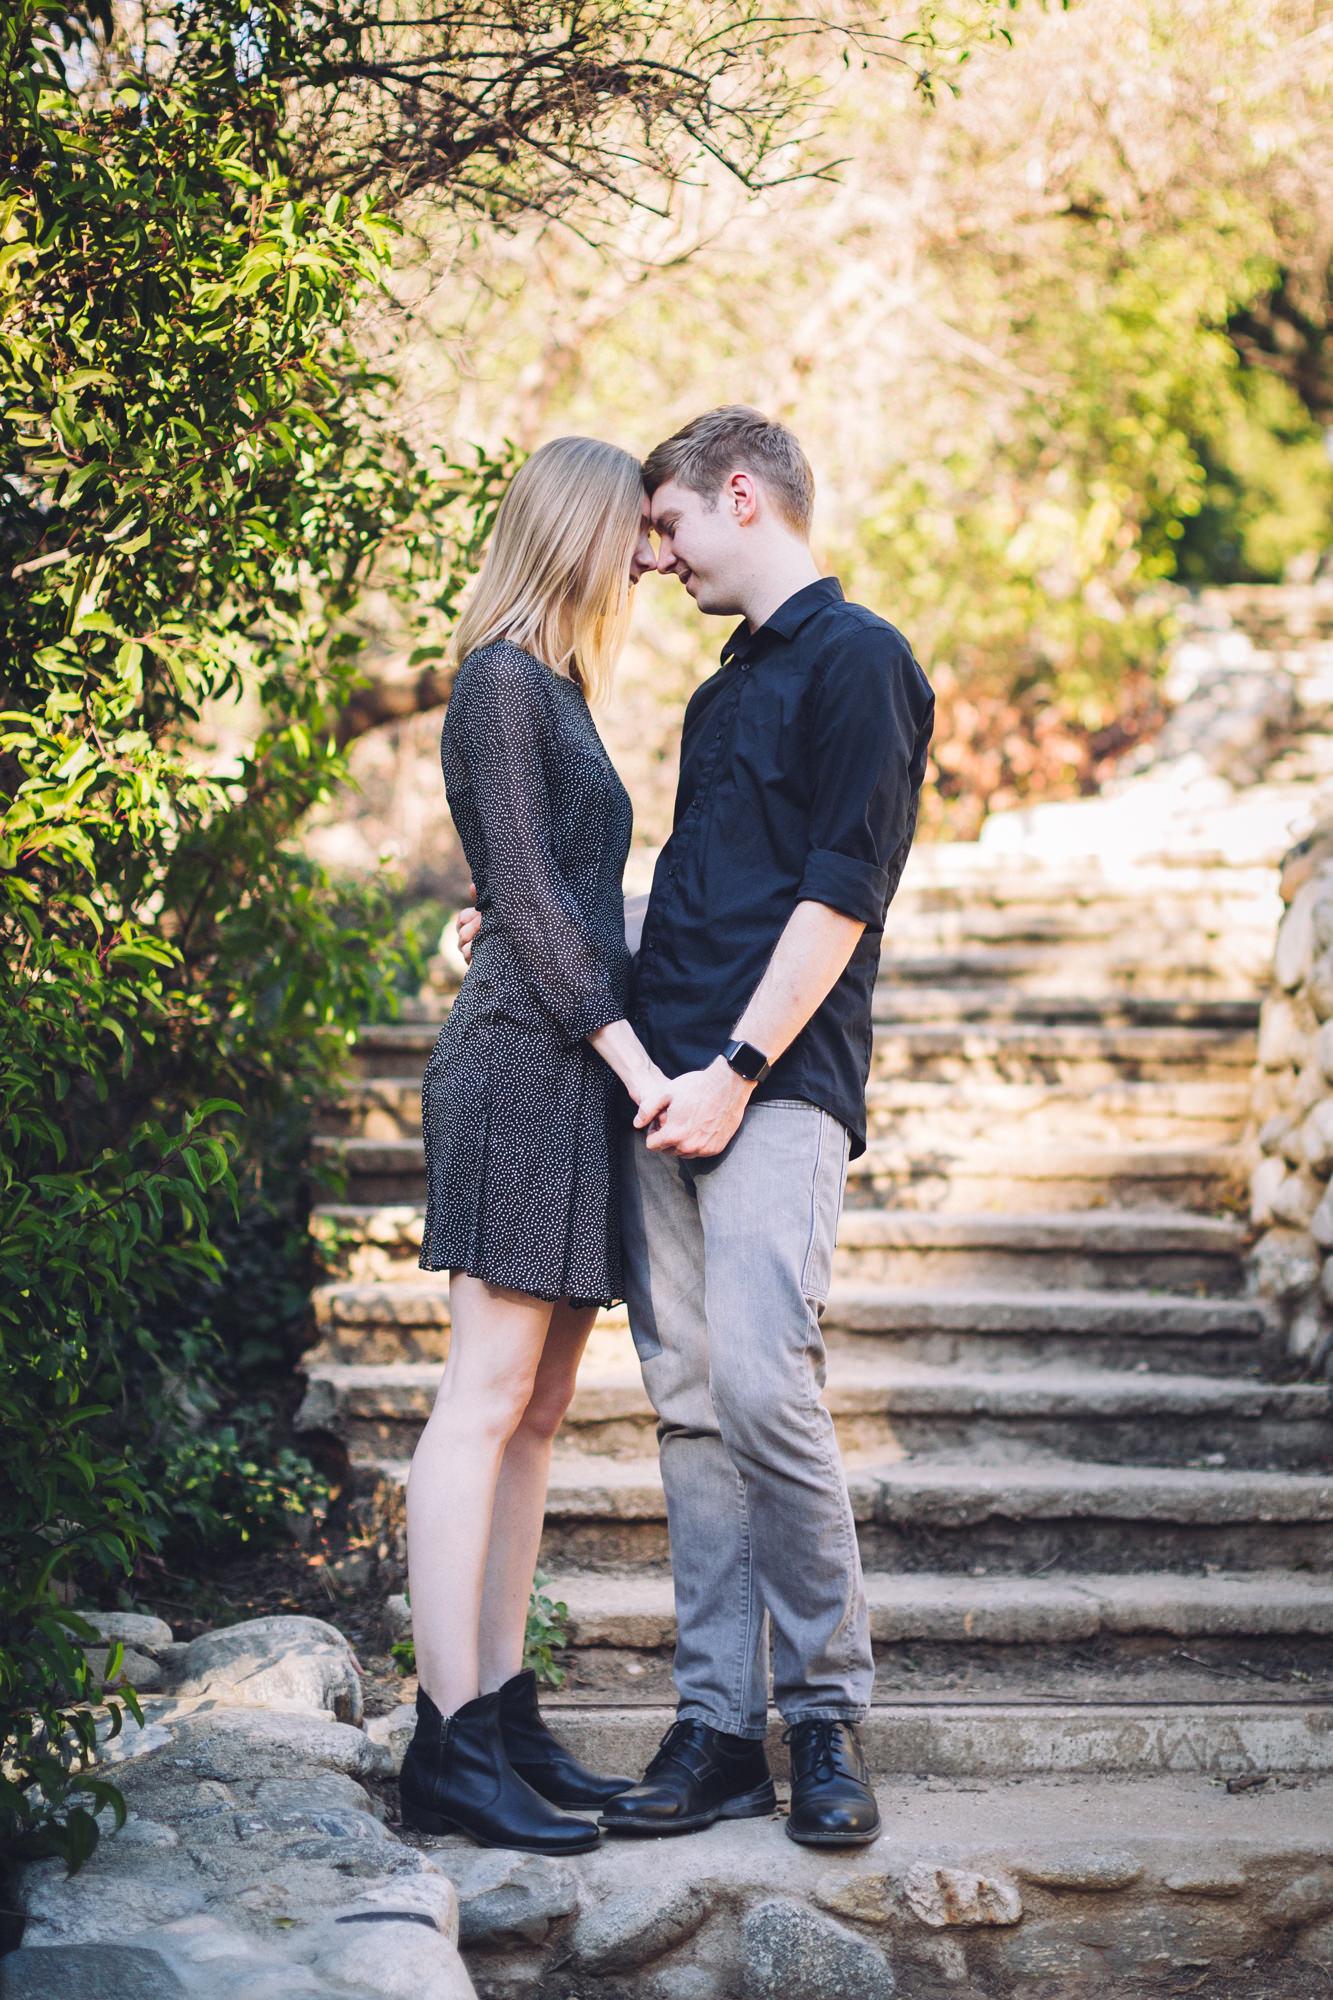 thelightandglass-wedding-engagement-photography-034.jpg